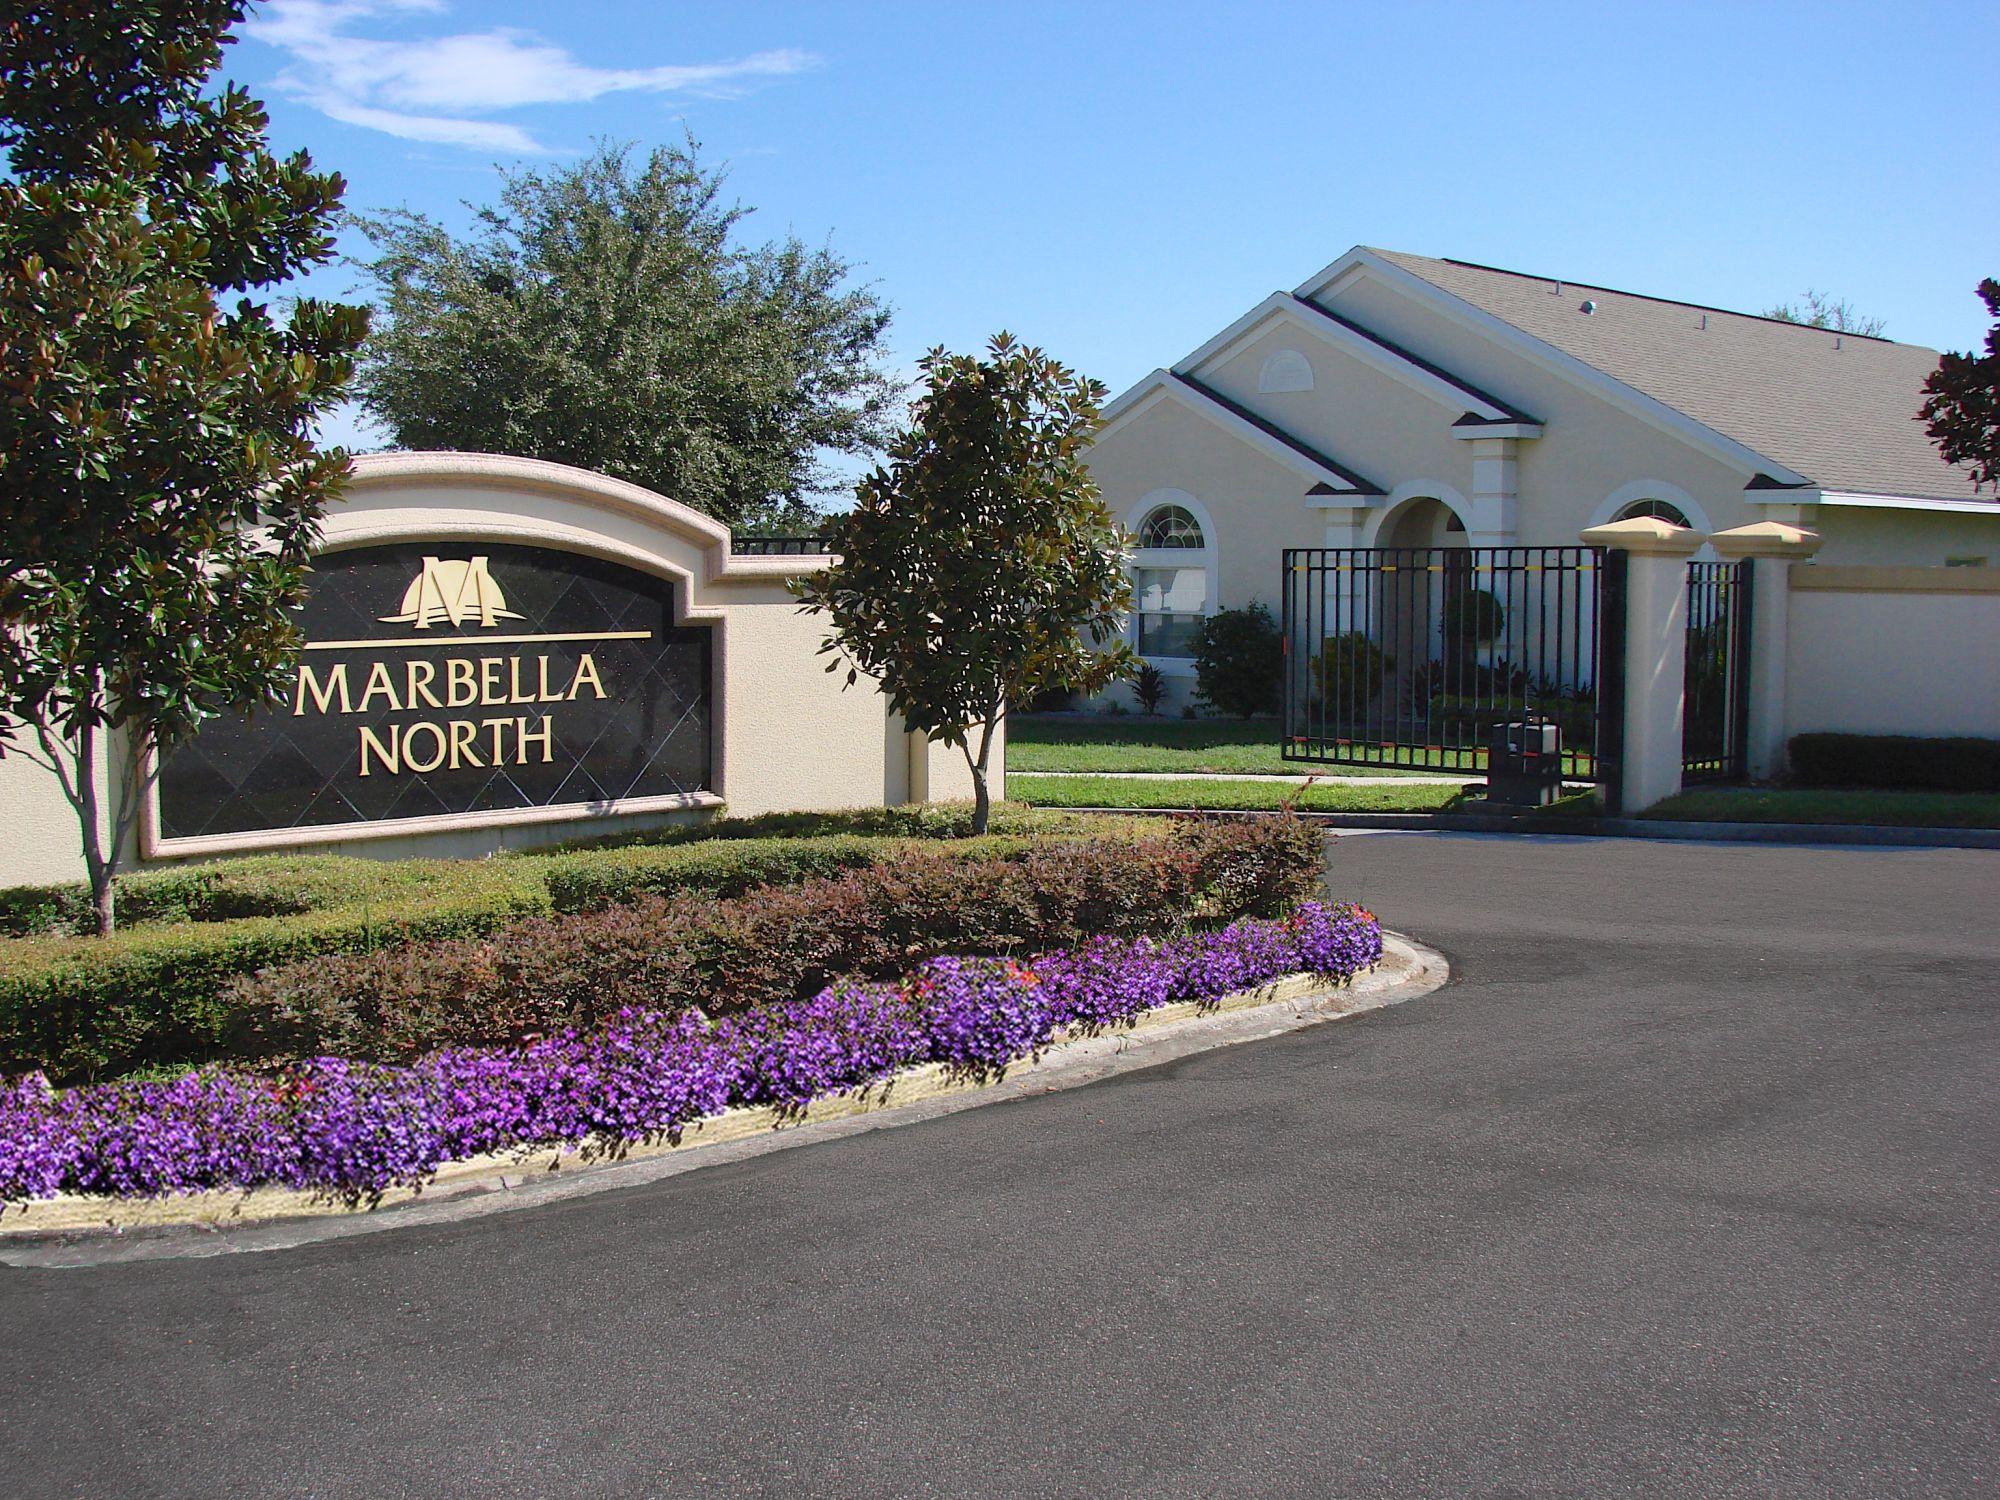 Marbella North Entrance Marbella Resort  Davenport, Florida